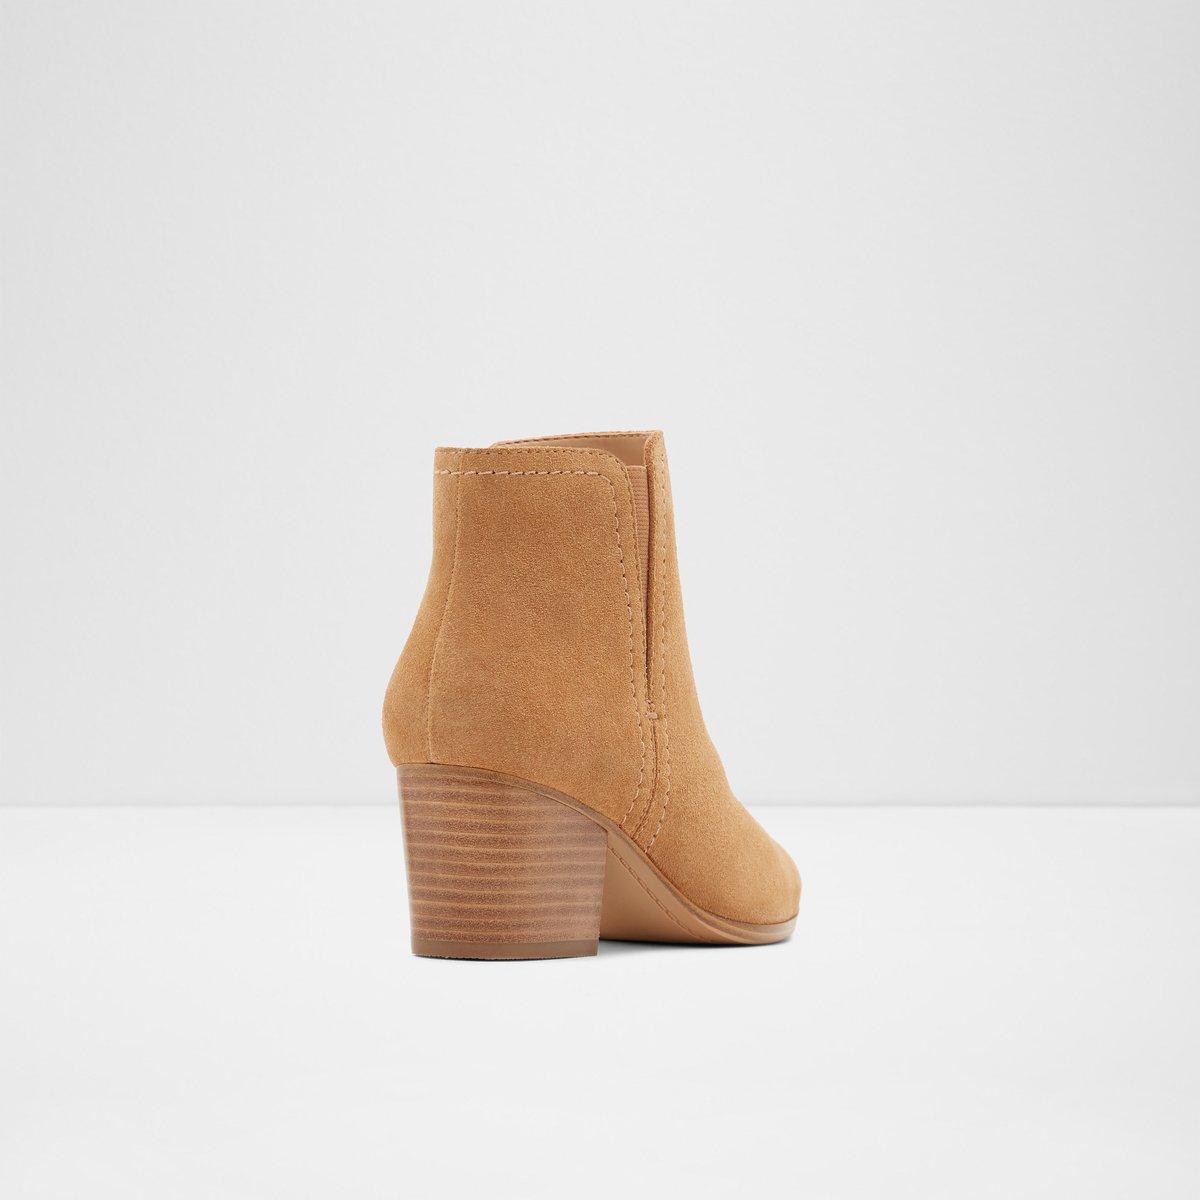 8a0055ac778 Larissi Light Brown Women's Ankle boots | ALDO Canada